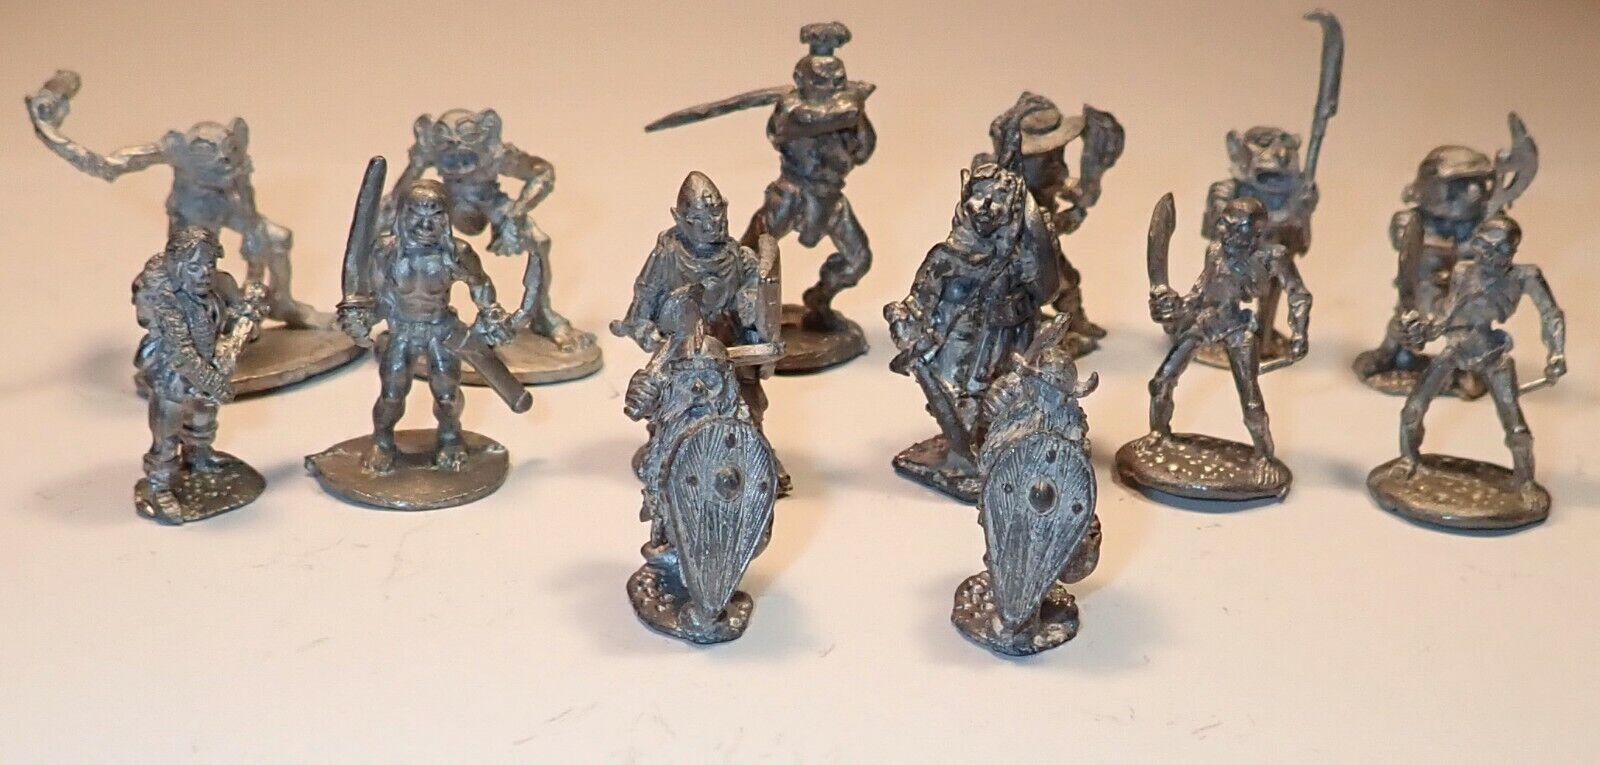 Vintage 1980s metal fantasy miniatures (ral partha, others) (unpainted, loose)